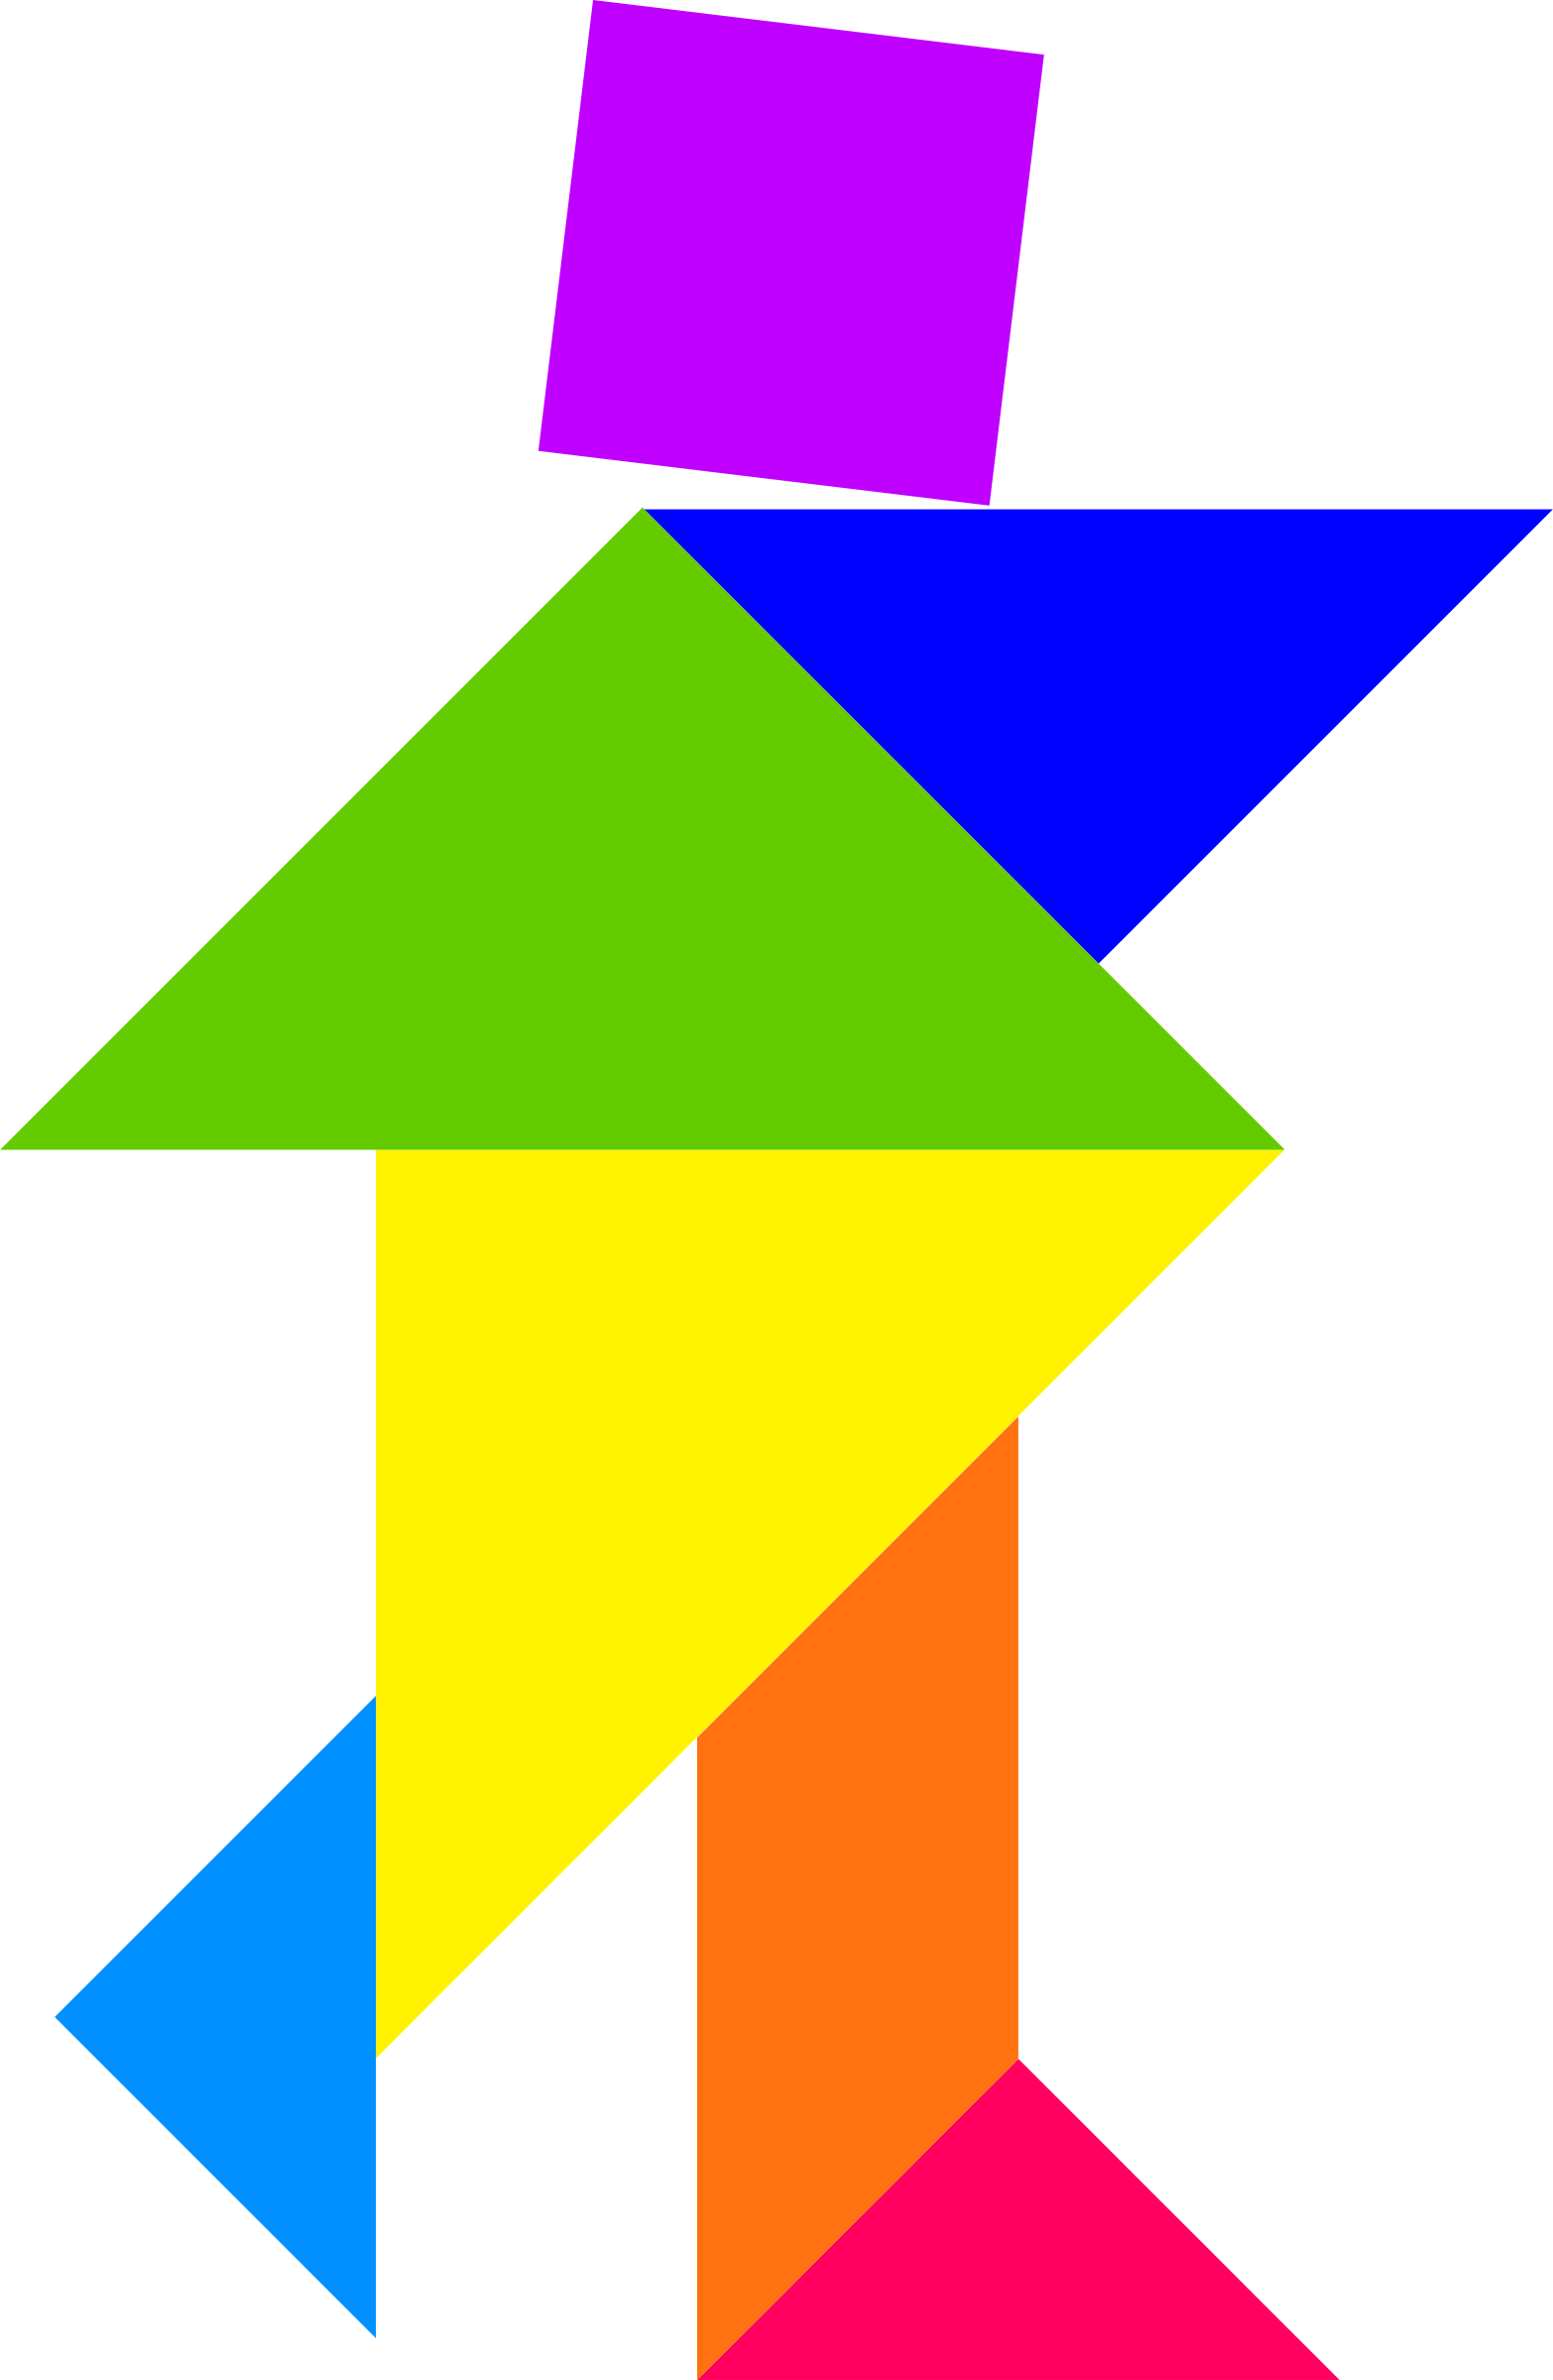 Tangram big image png. Clipart person color